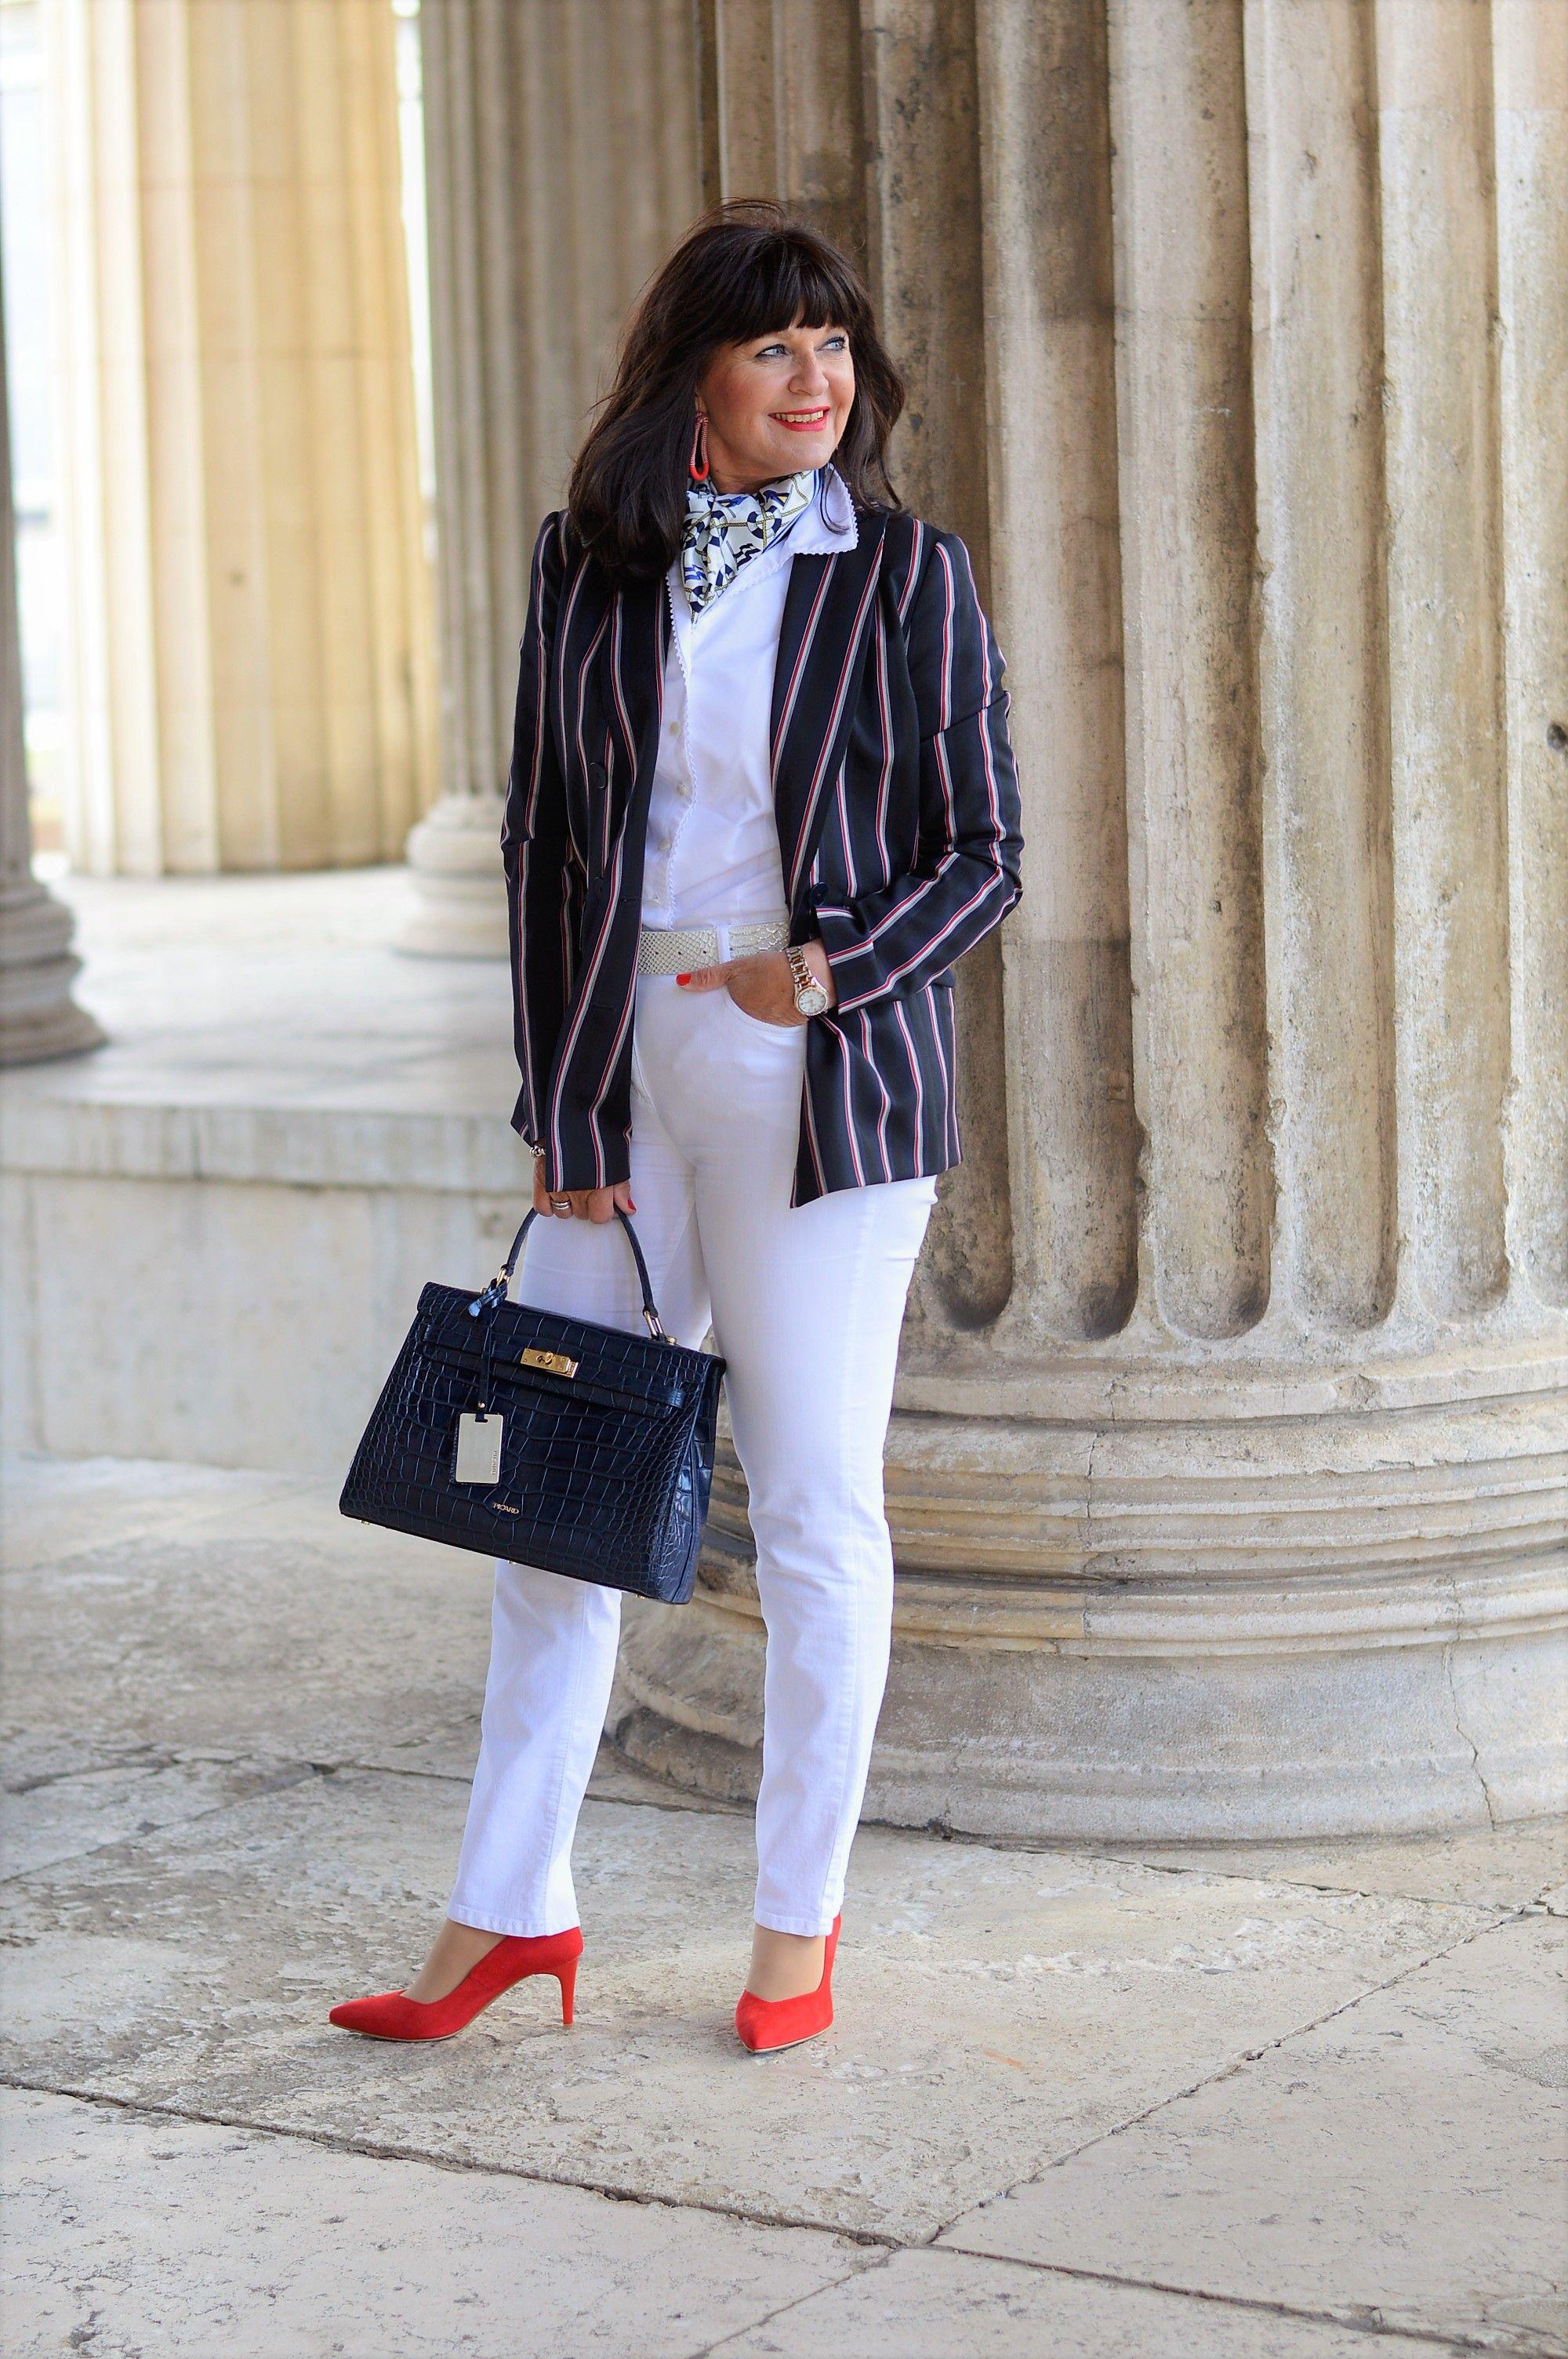 Sommerlook - Maritim | Weiße jeans, Modestil, Maritimer look